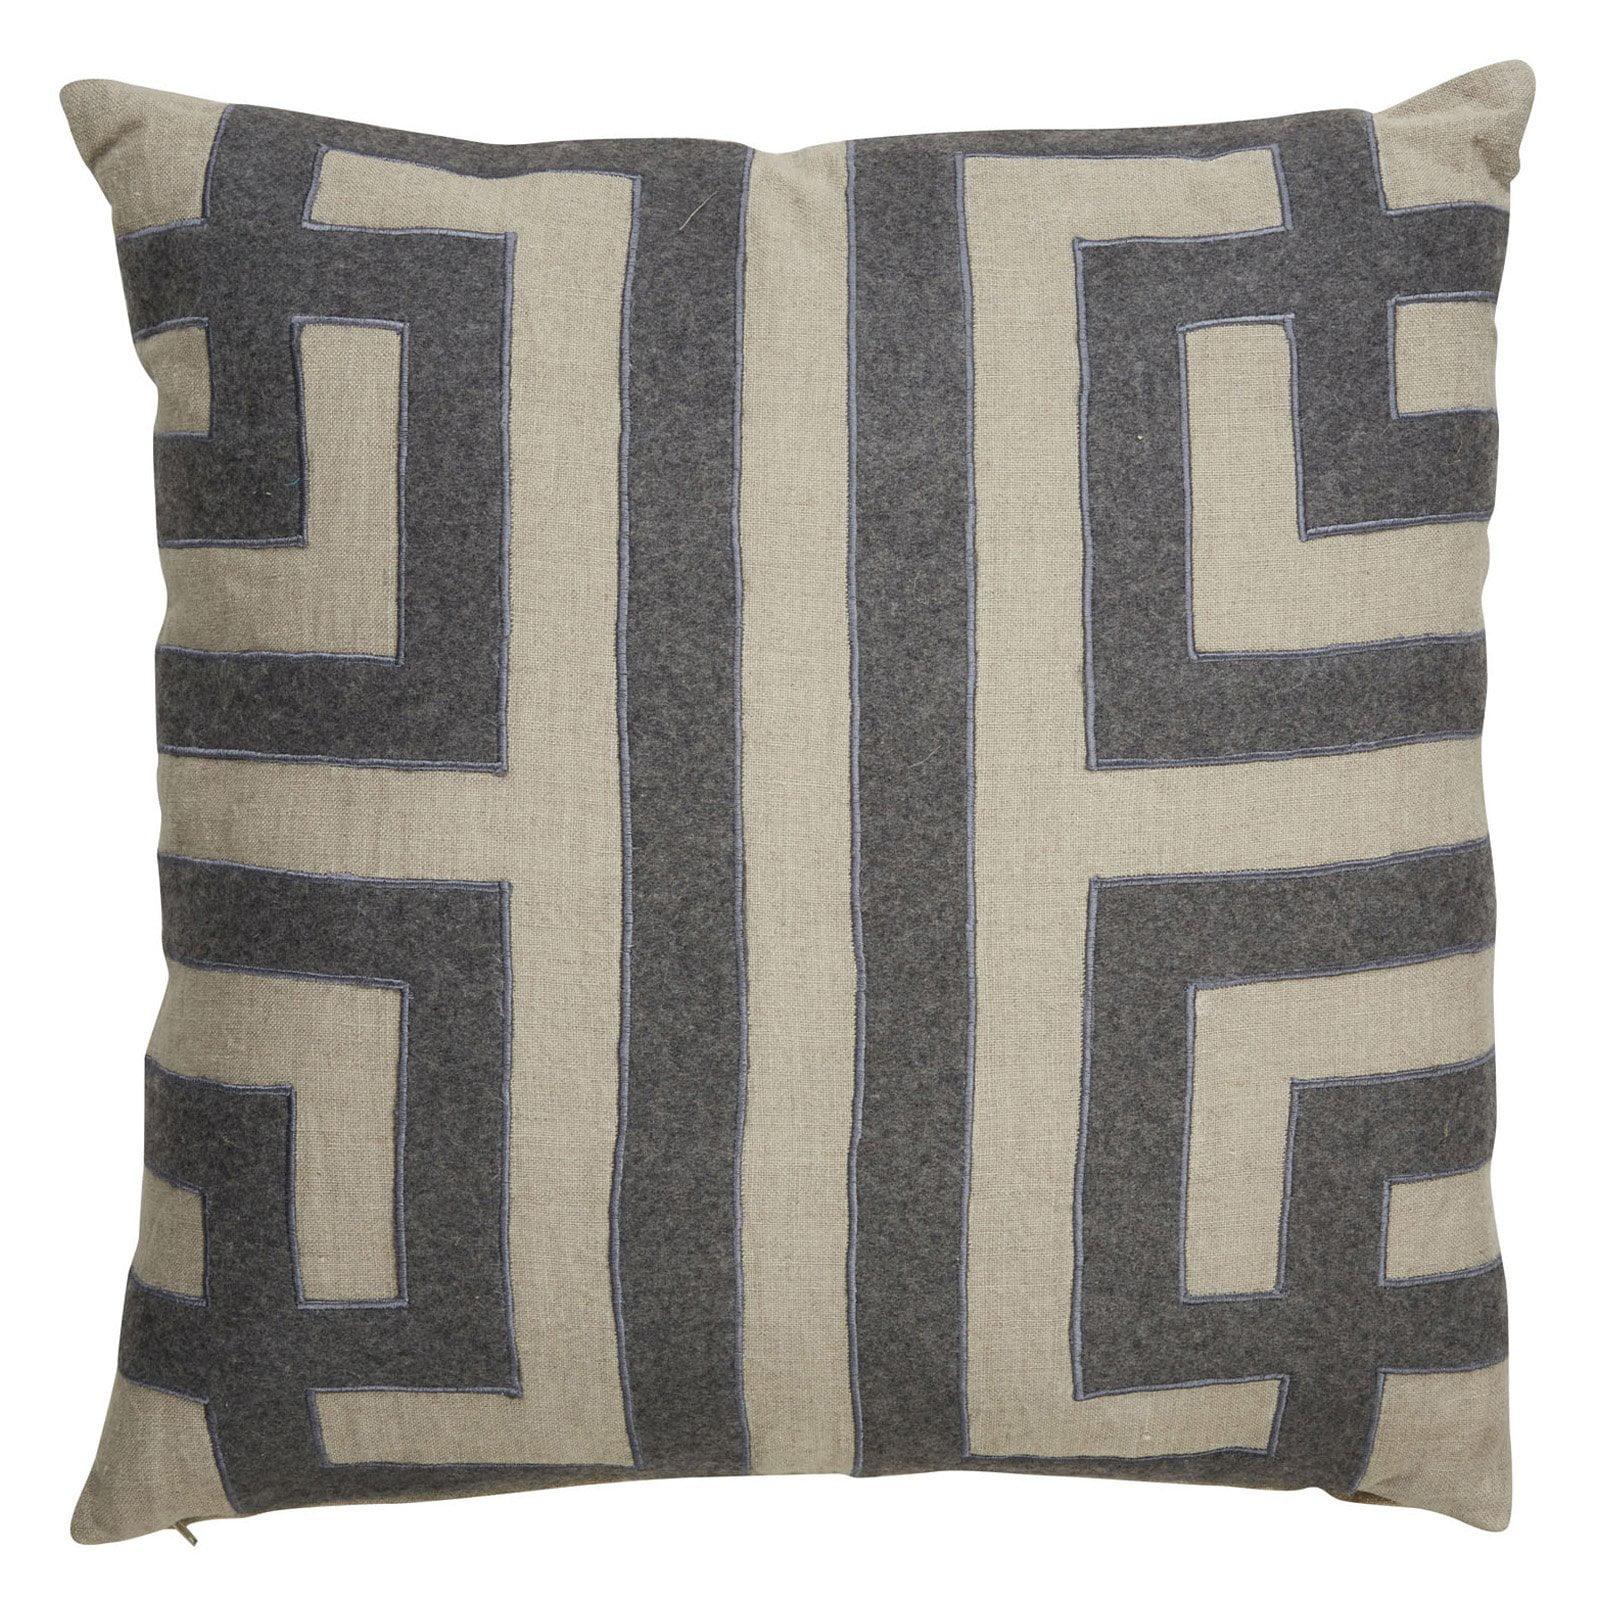 Nikki Chu by Jaipur Geometric Linen Square Decorative Pillow